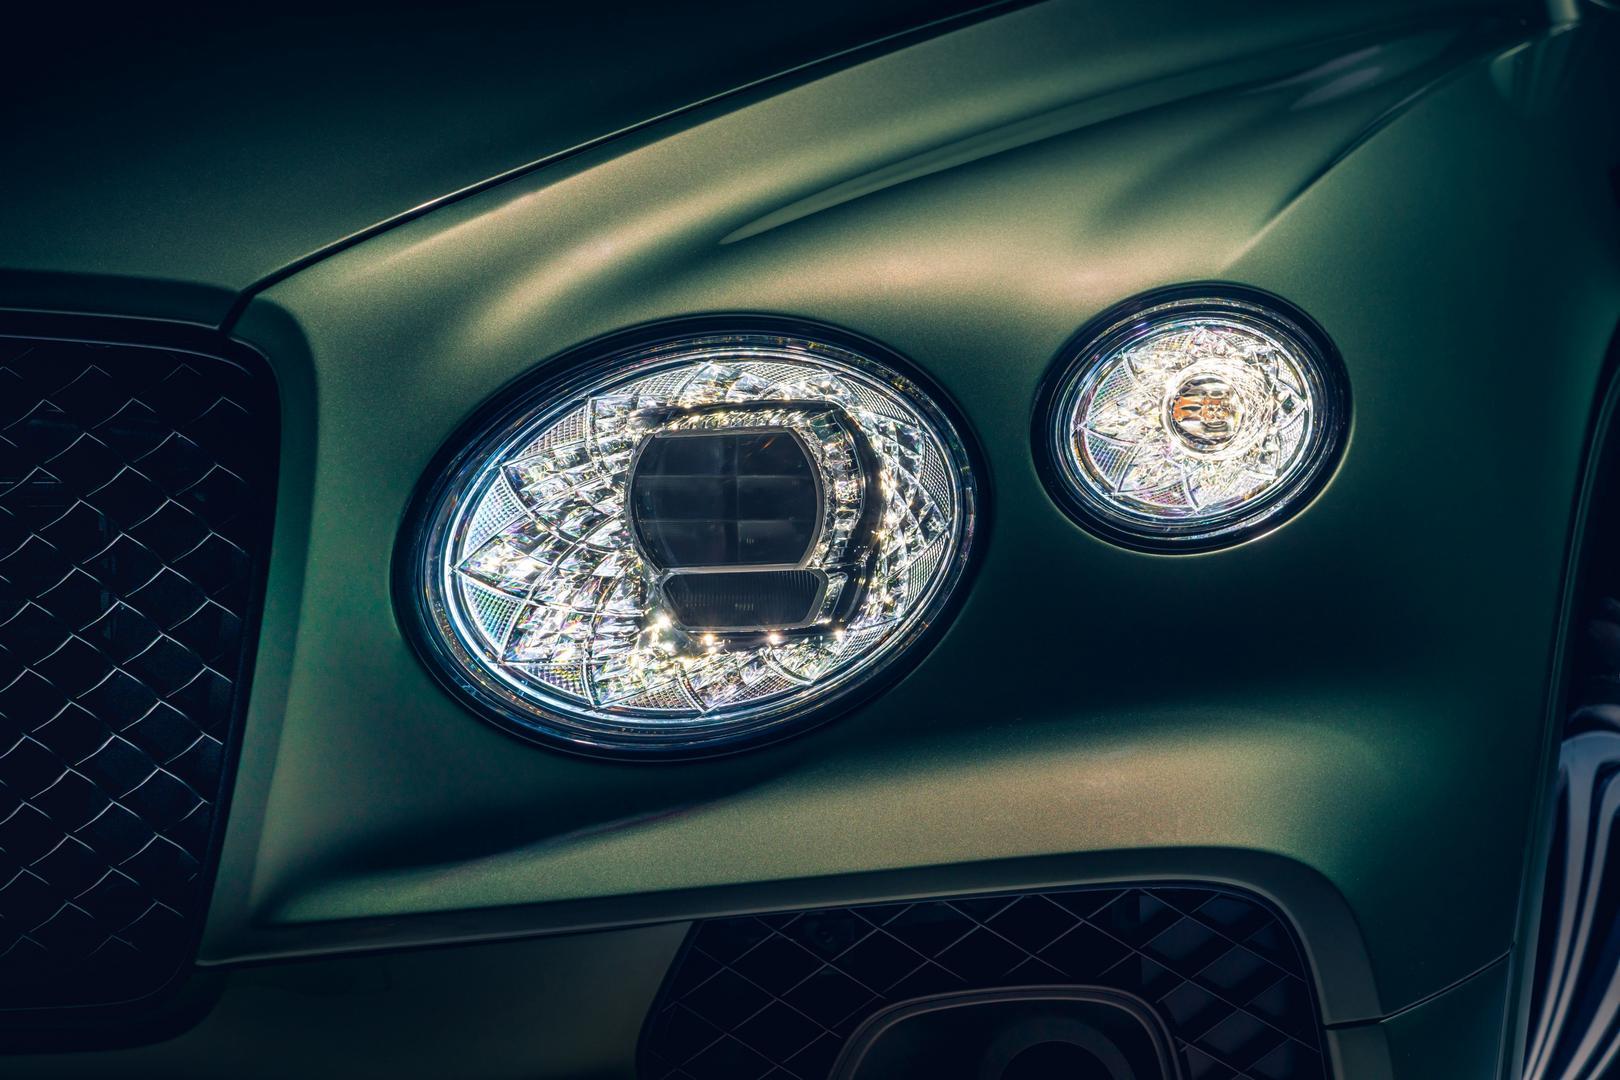 2021 Bentley Bentayga Headlights